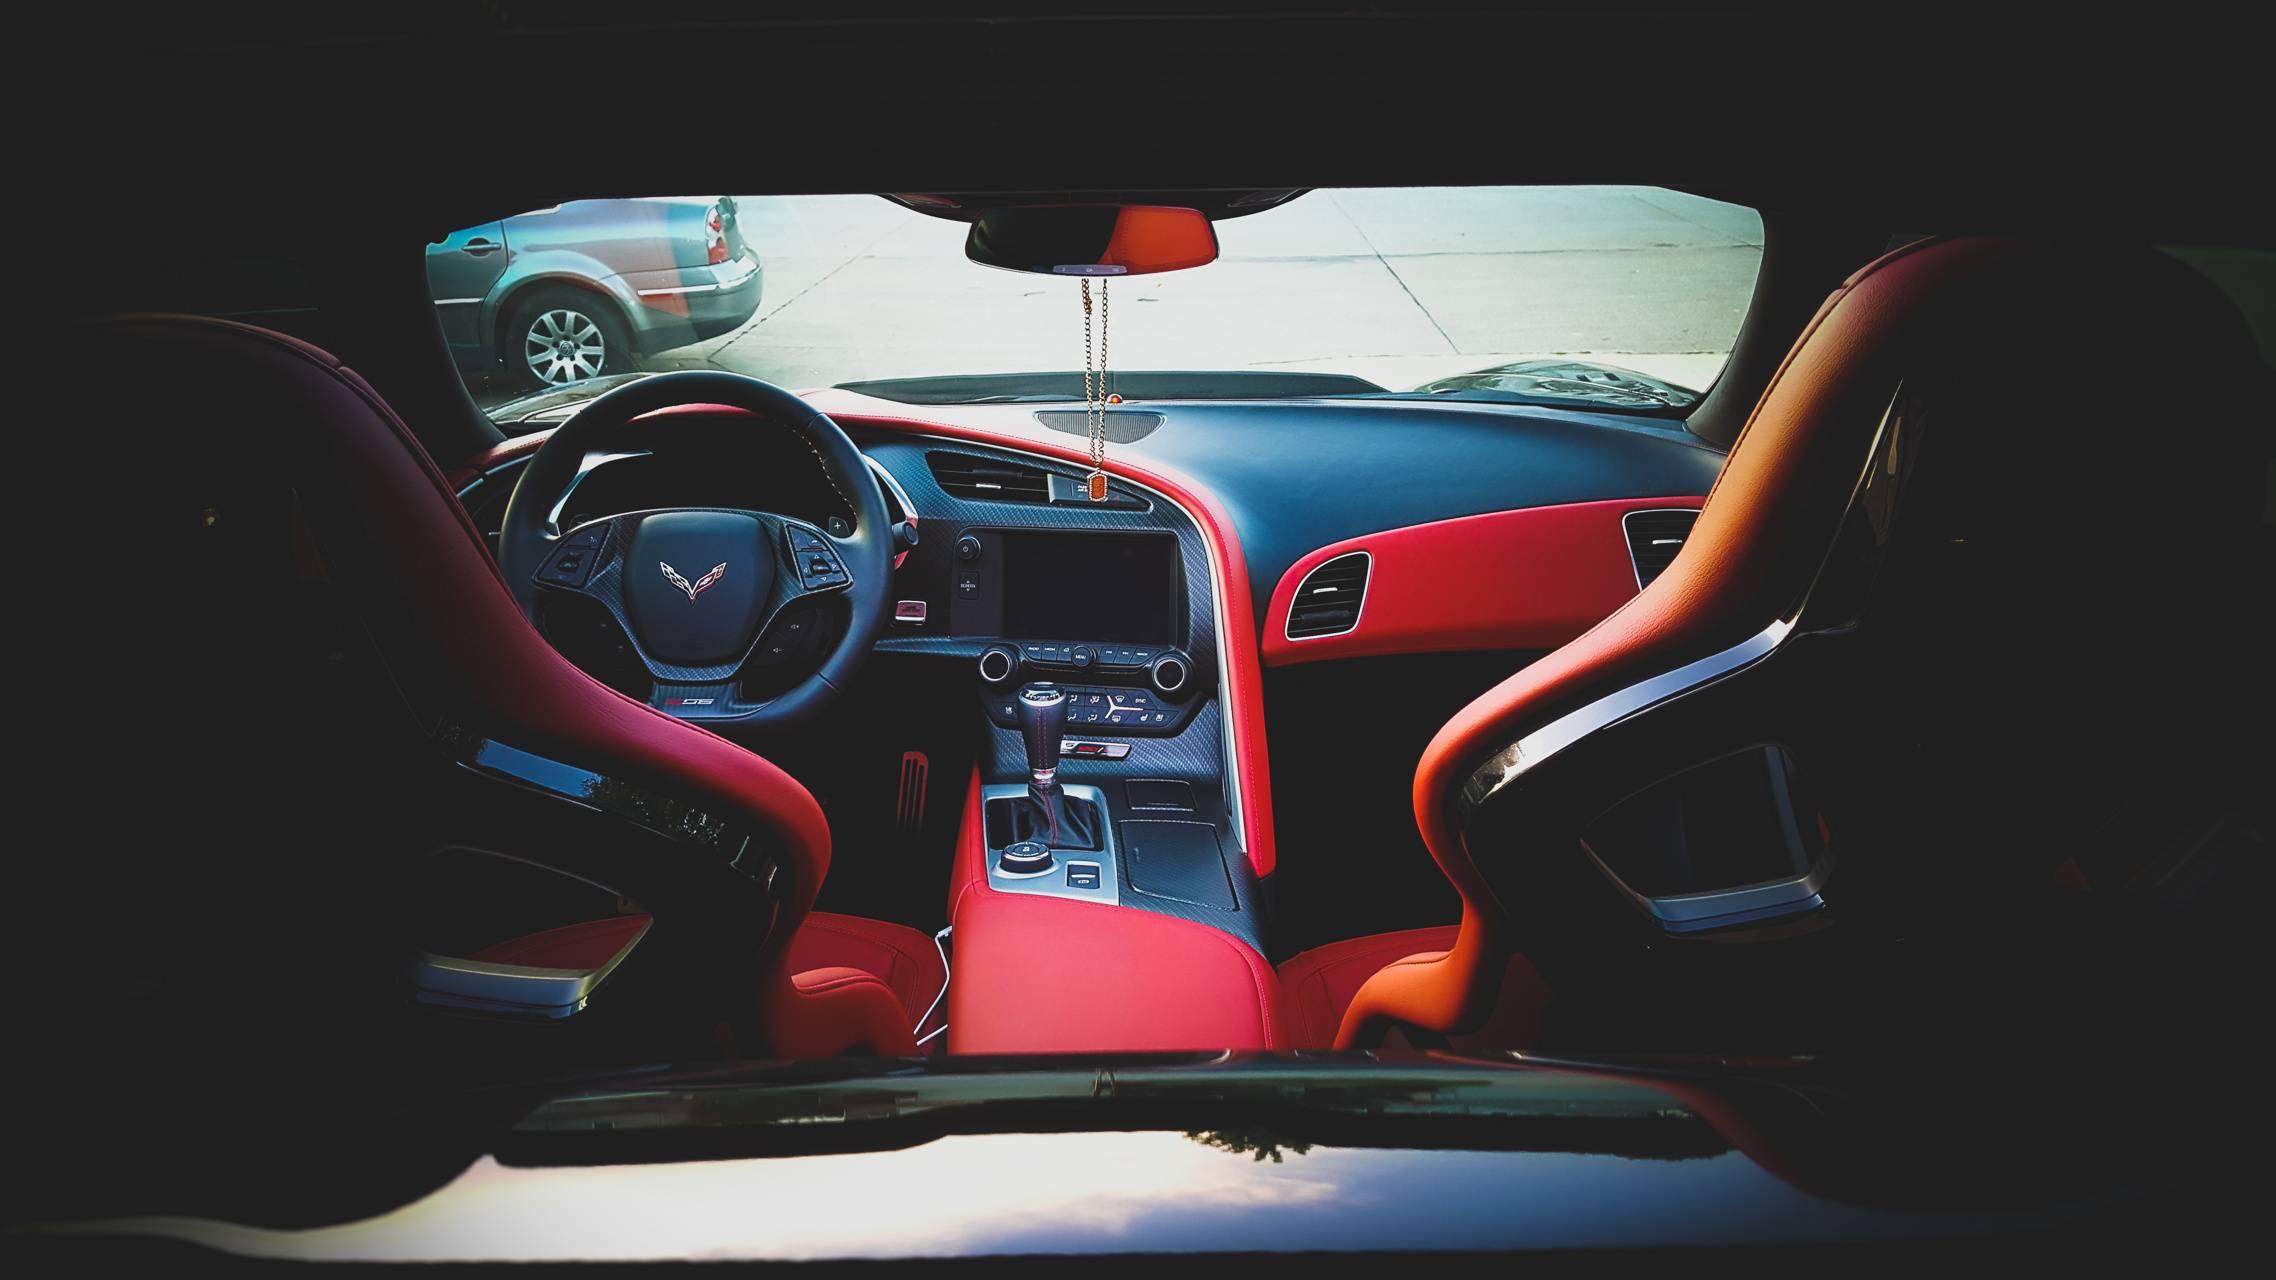 C7 Corvette Z06